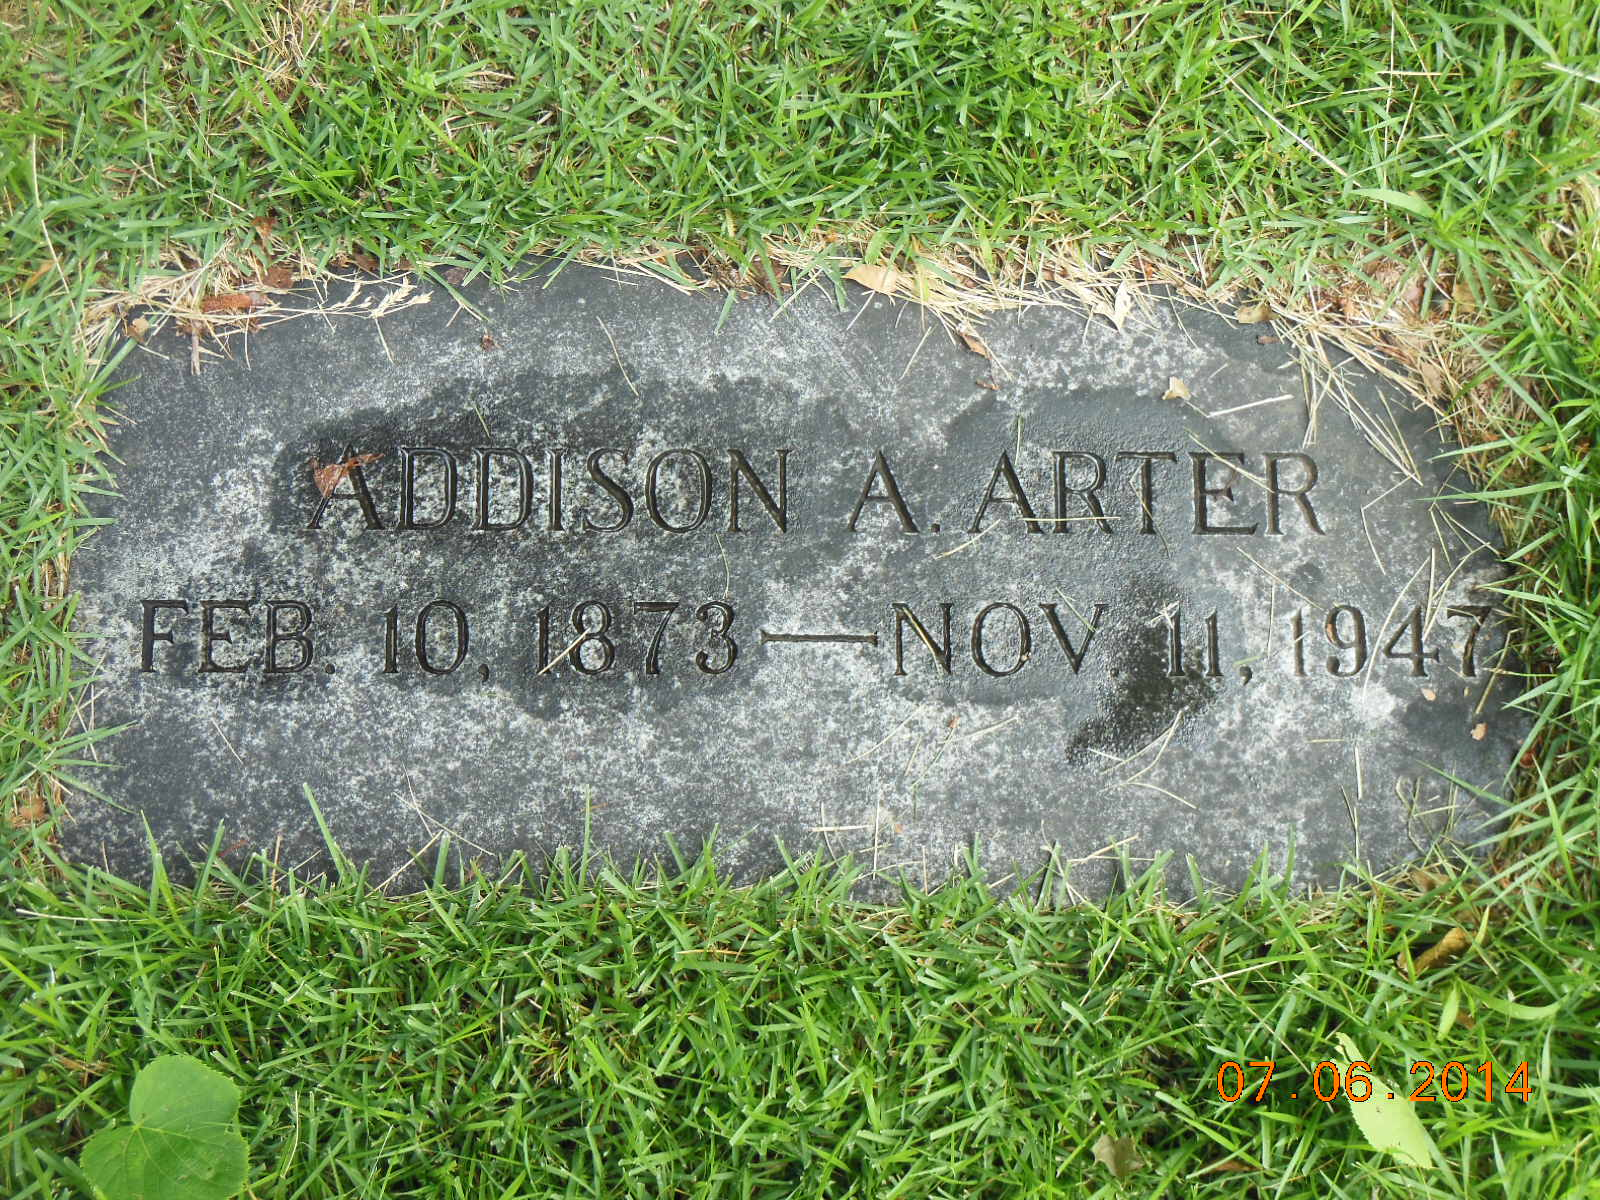 Addison A Arter